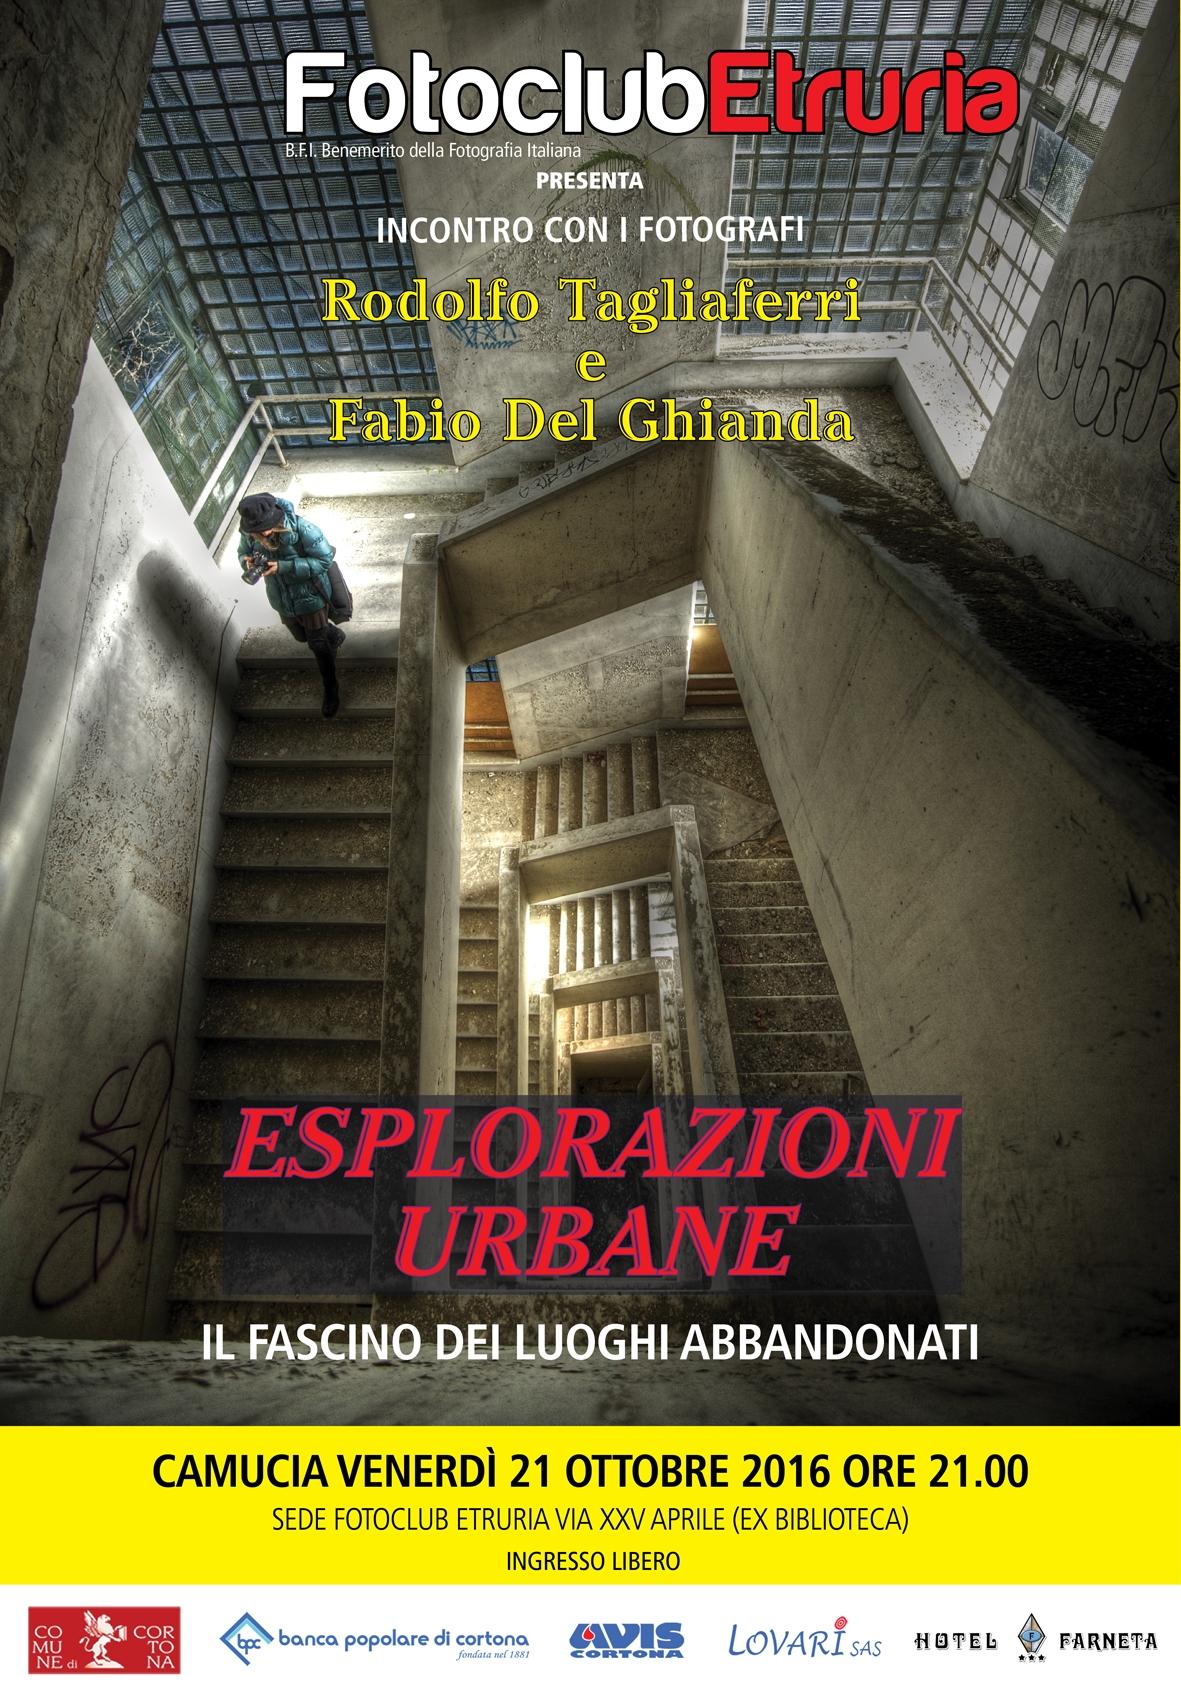 'Urban Exploration' al Fotoclub Etruria